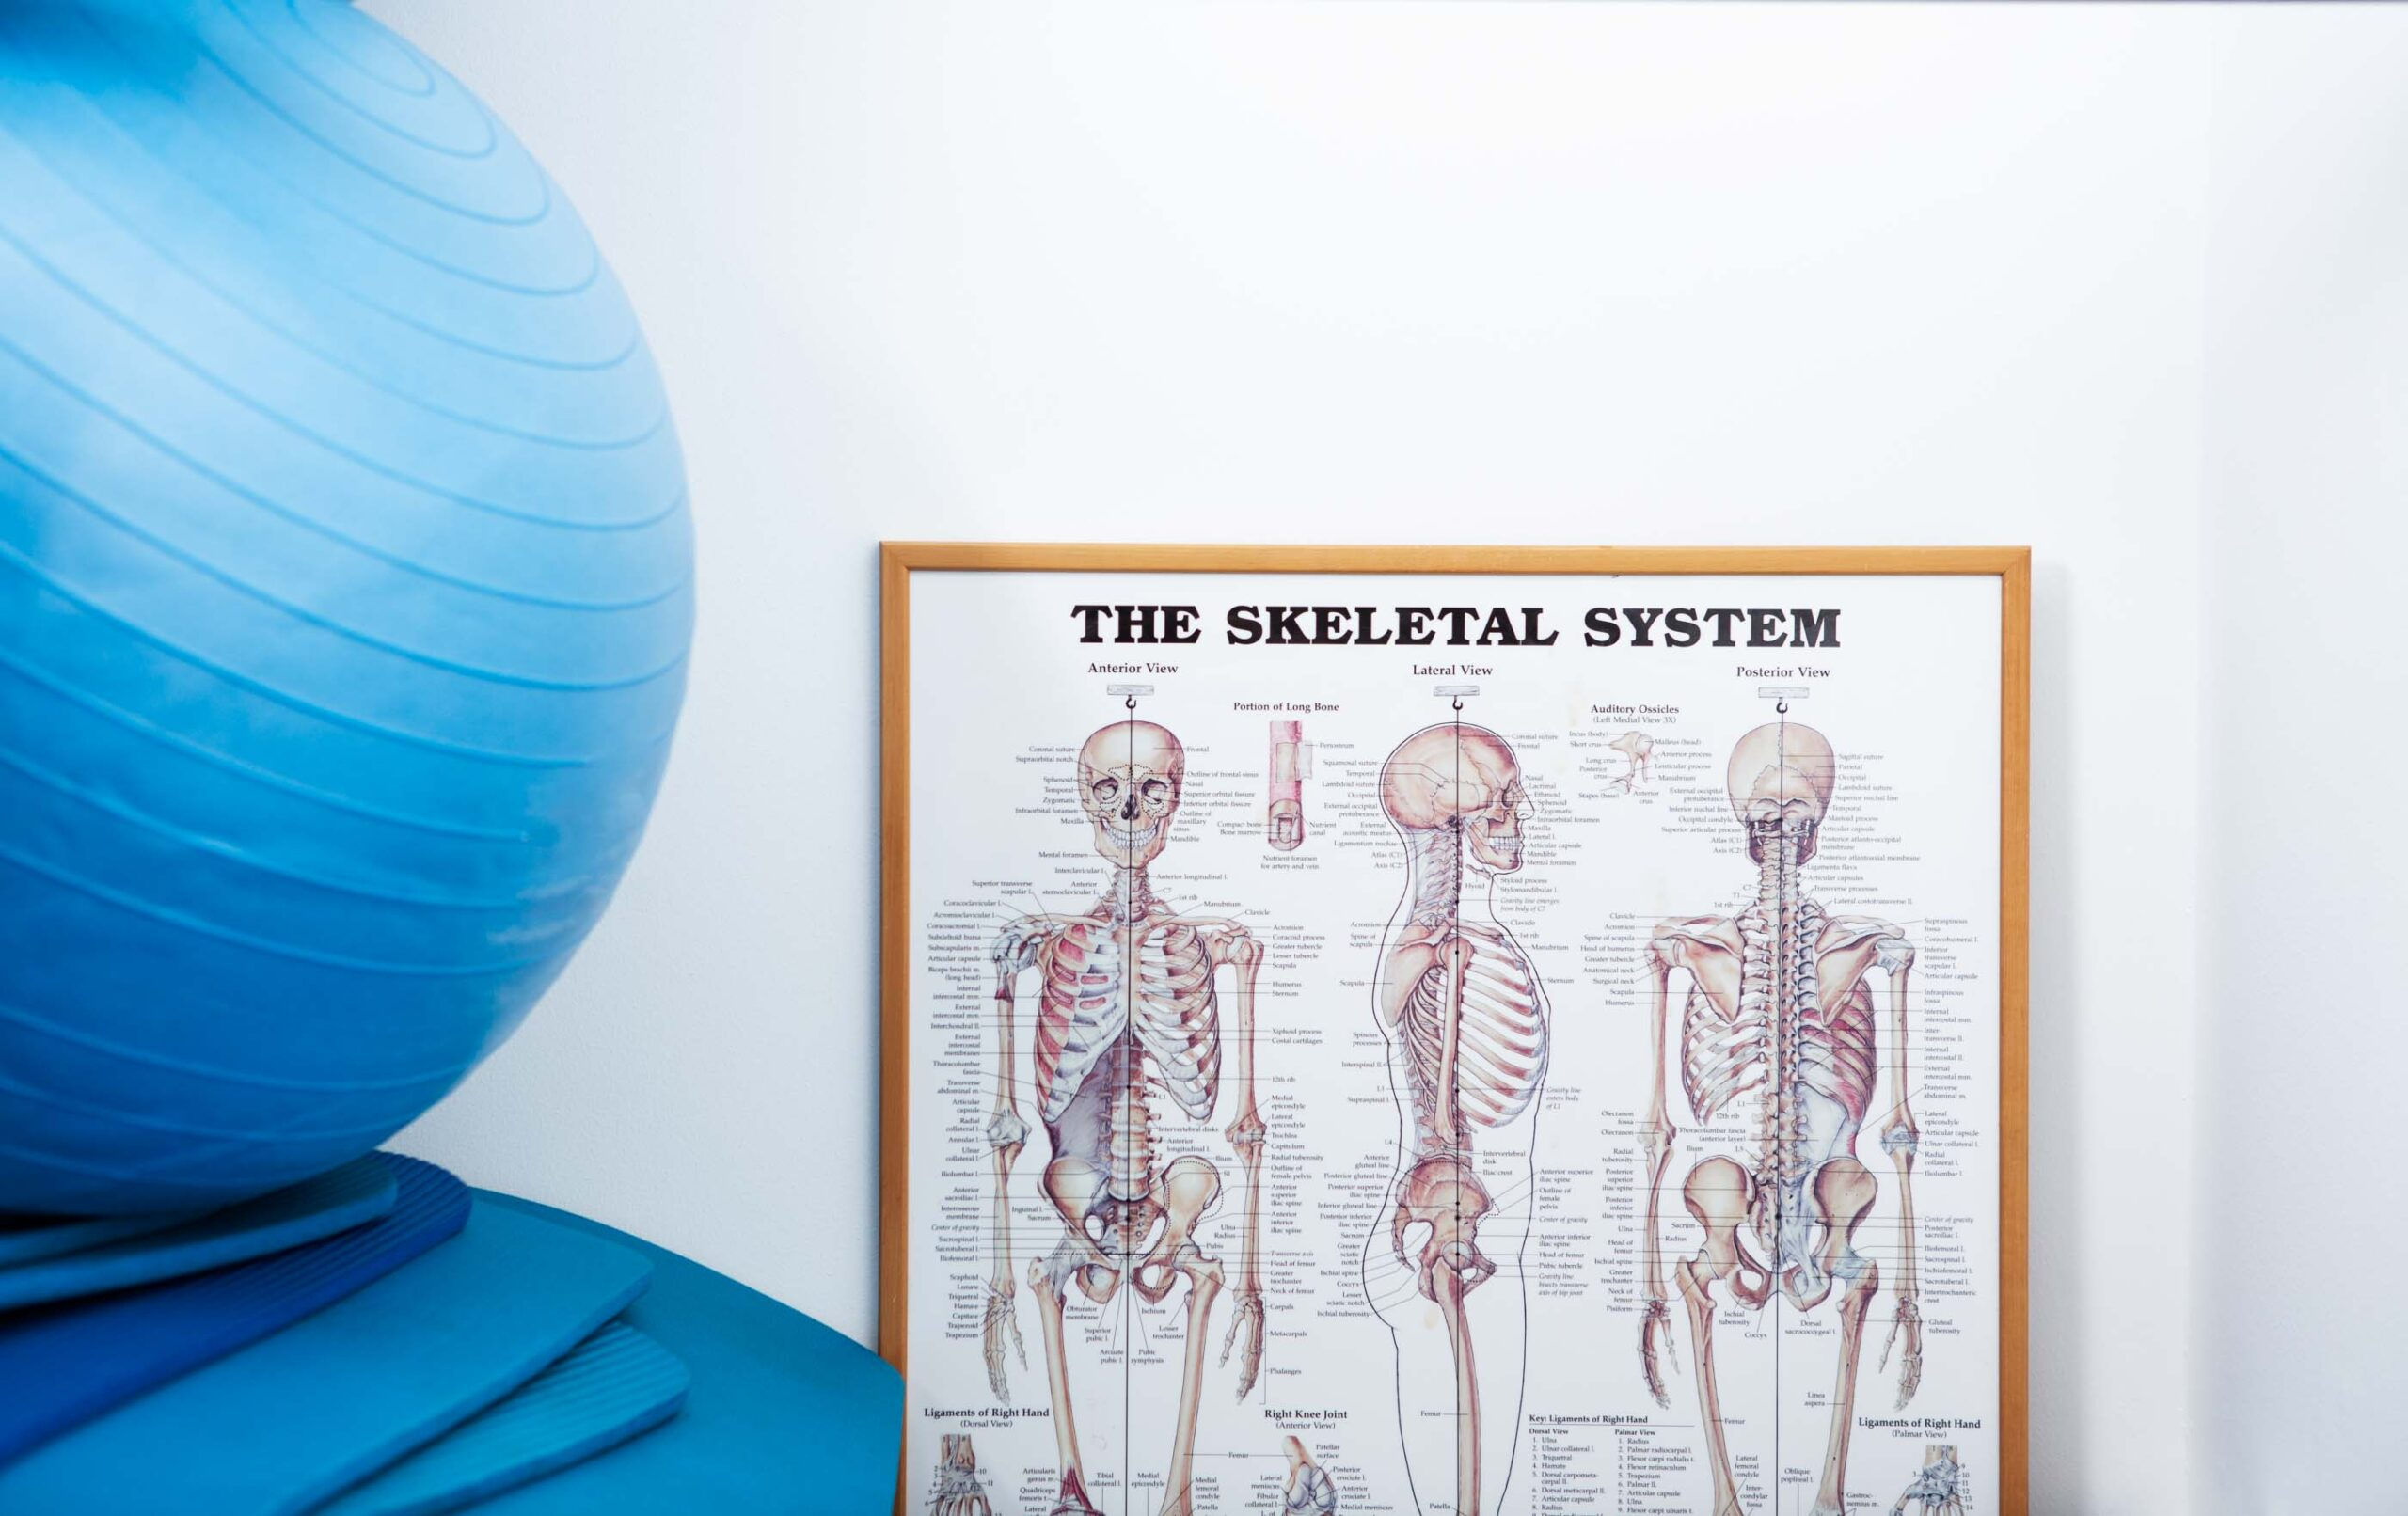 Human Skeleton Diagram and Exercise Ball